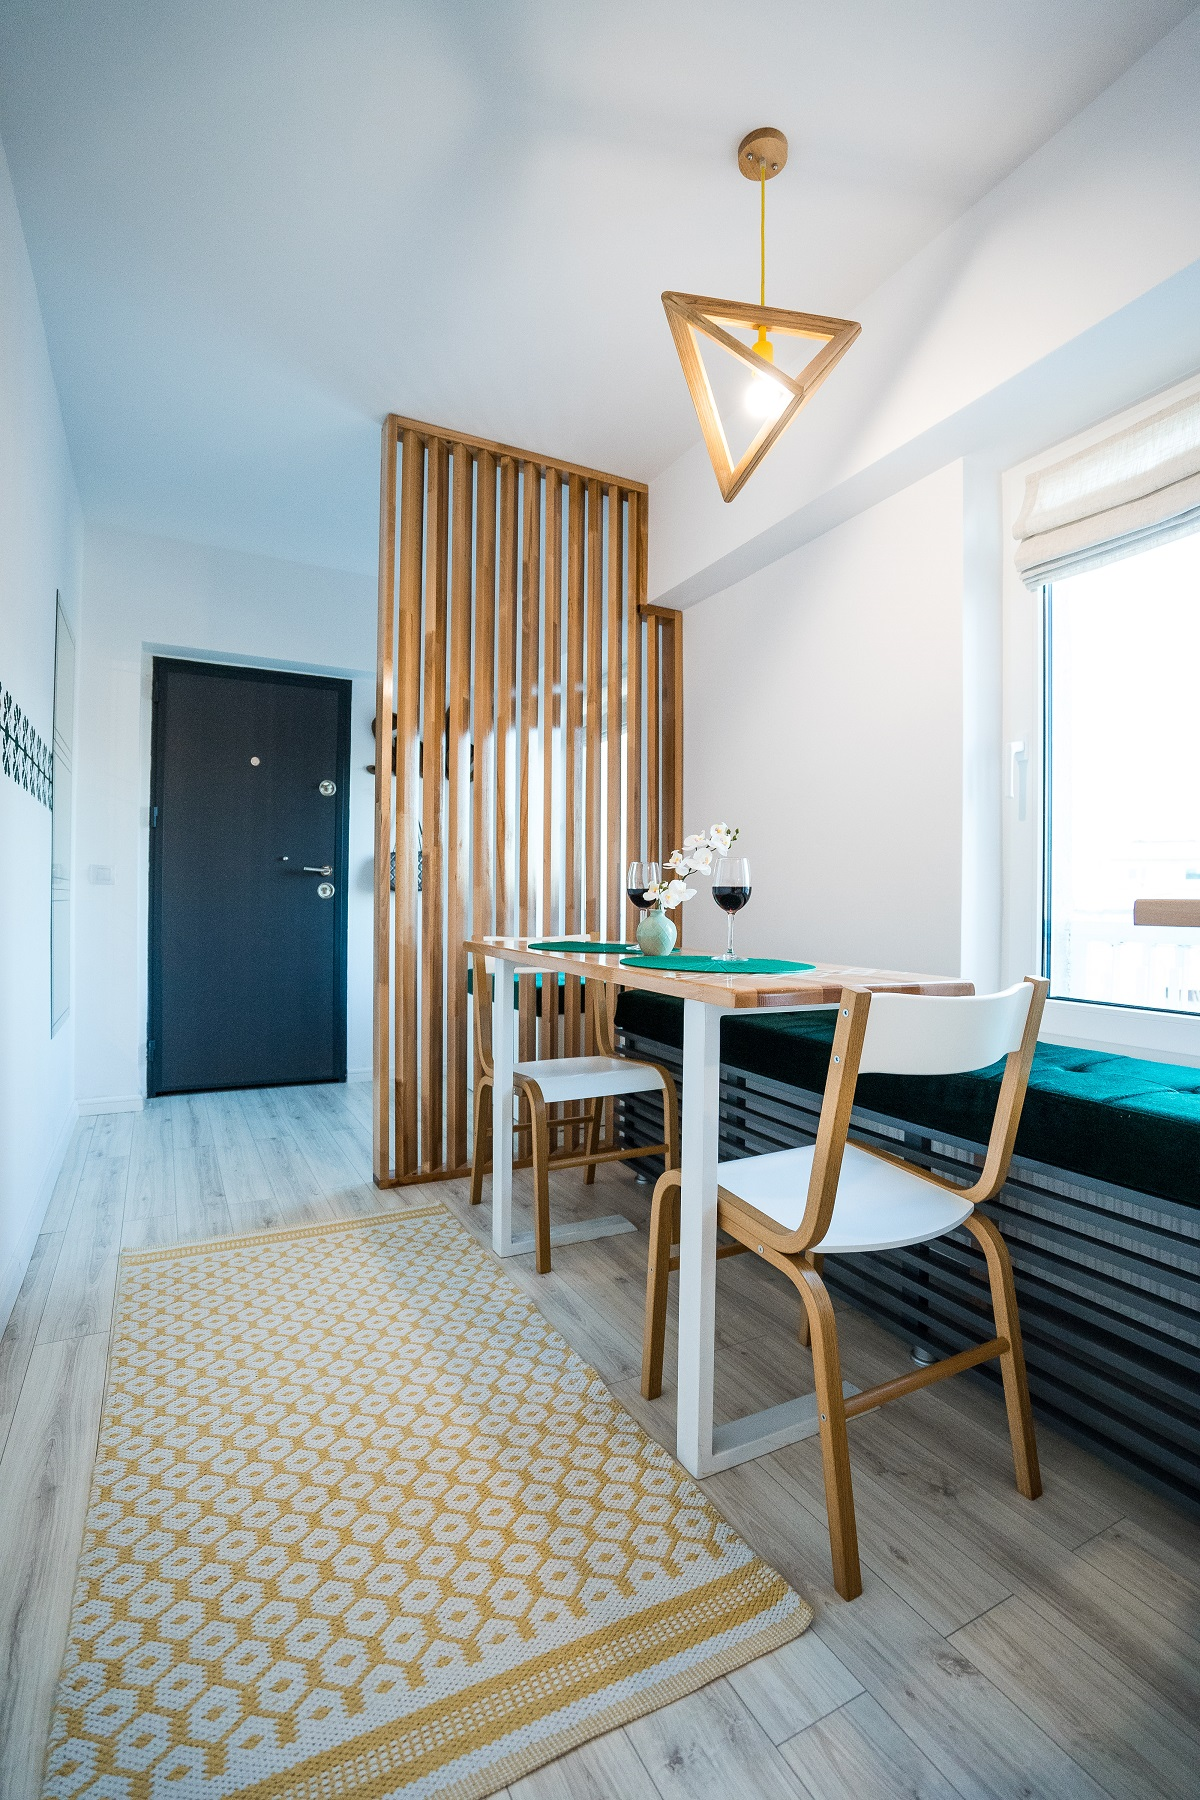 Amenajare de Interior apartament 3 camere Airbnb bucatarie 5